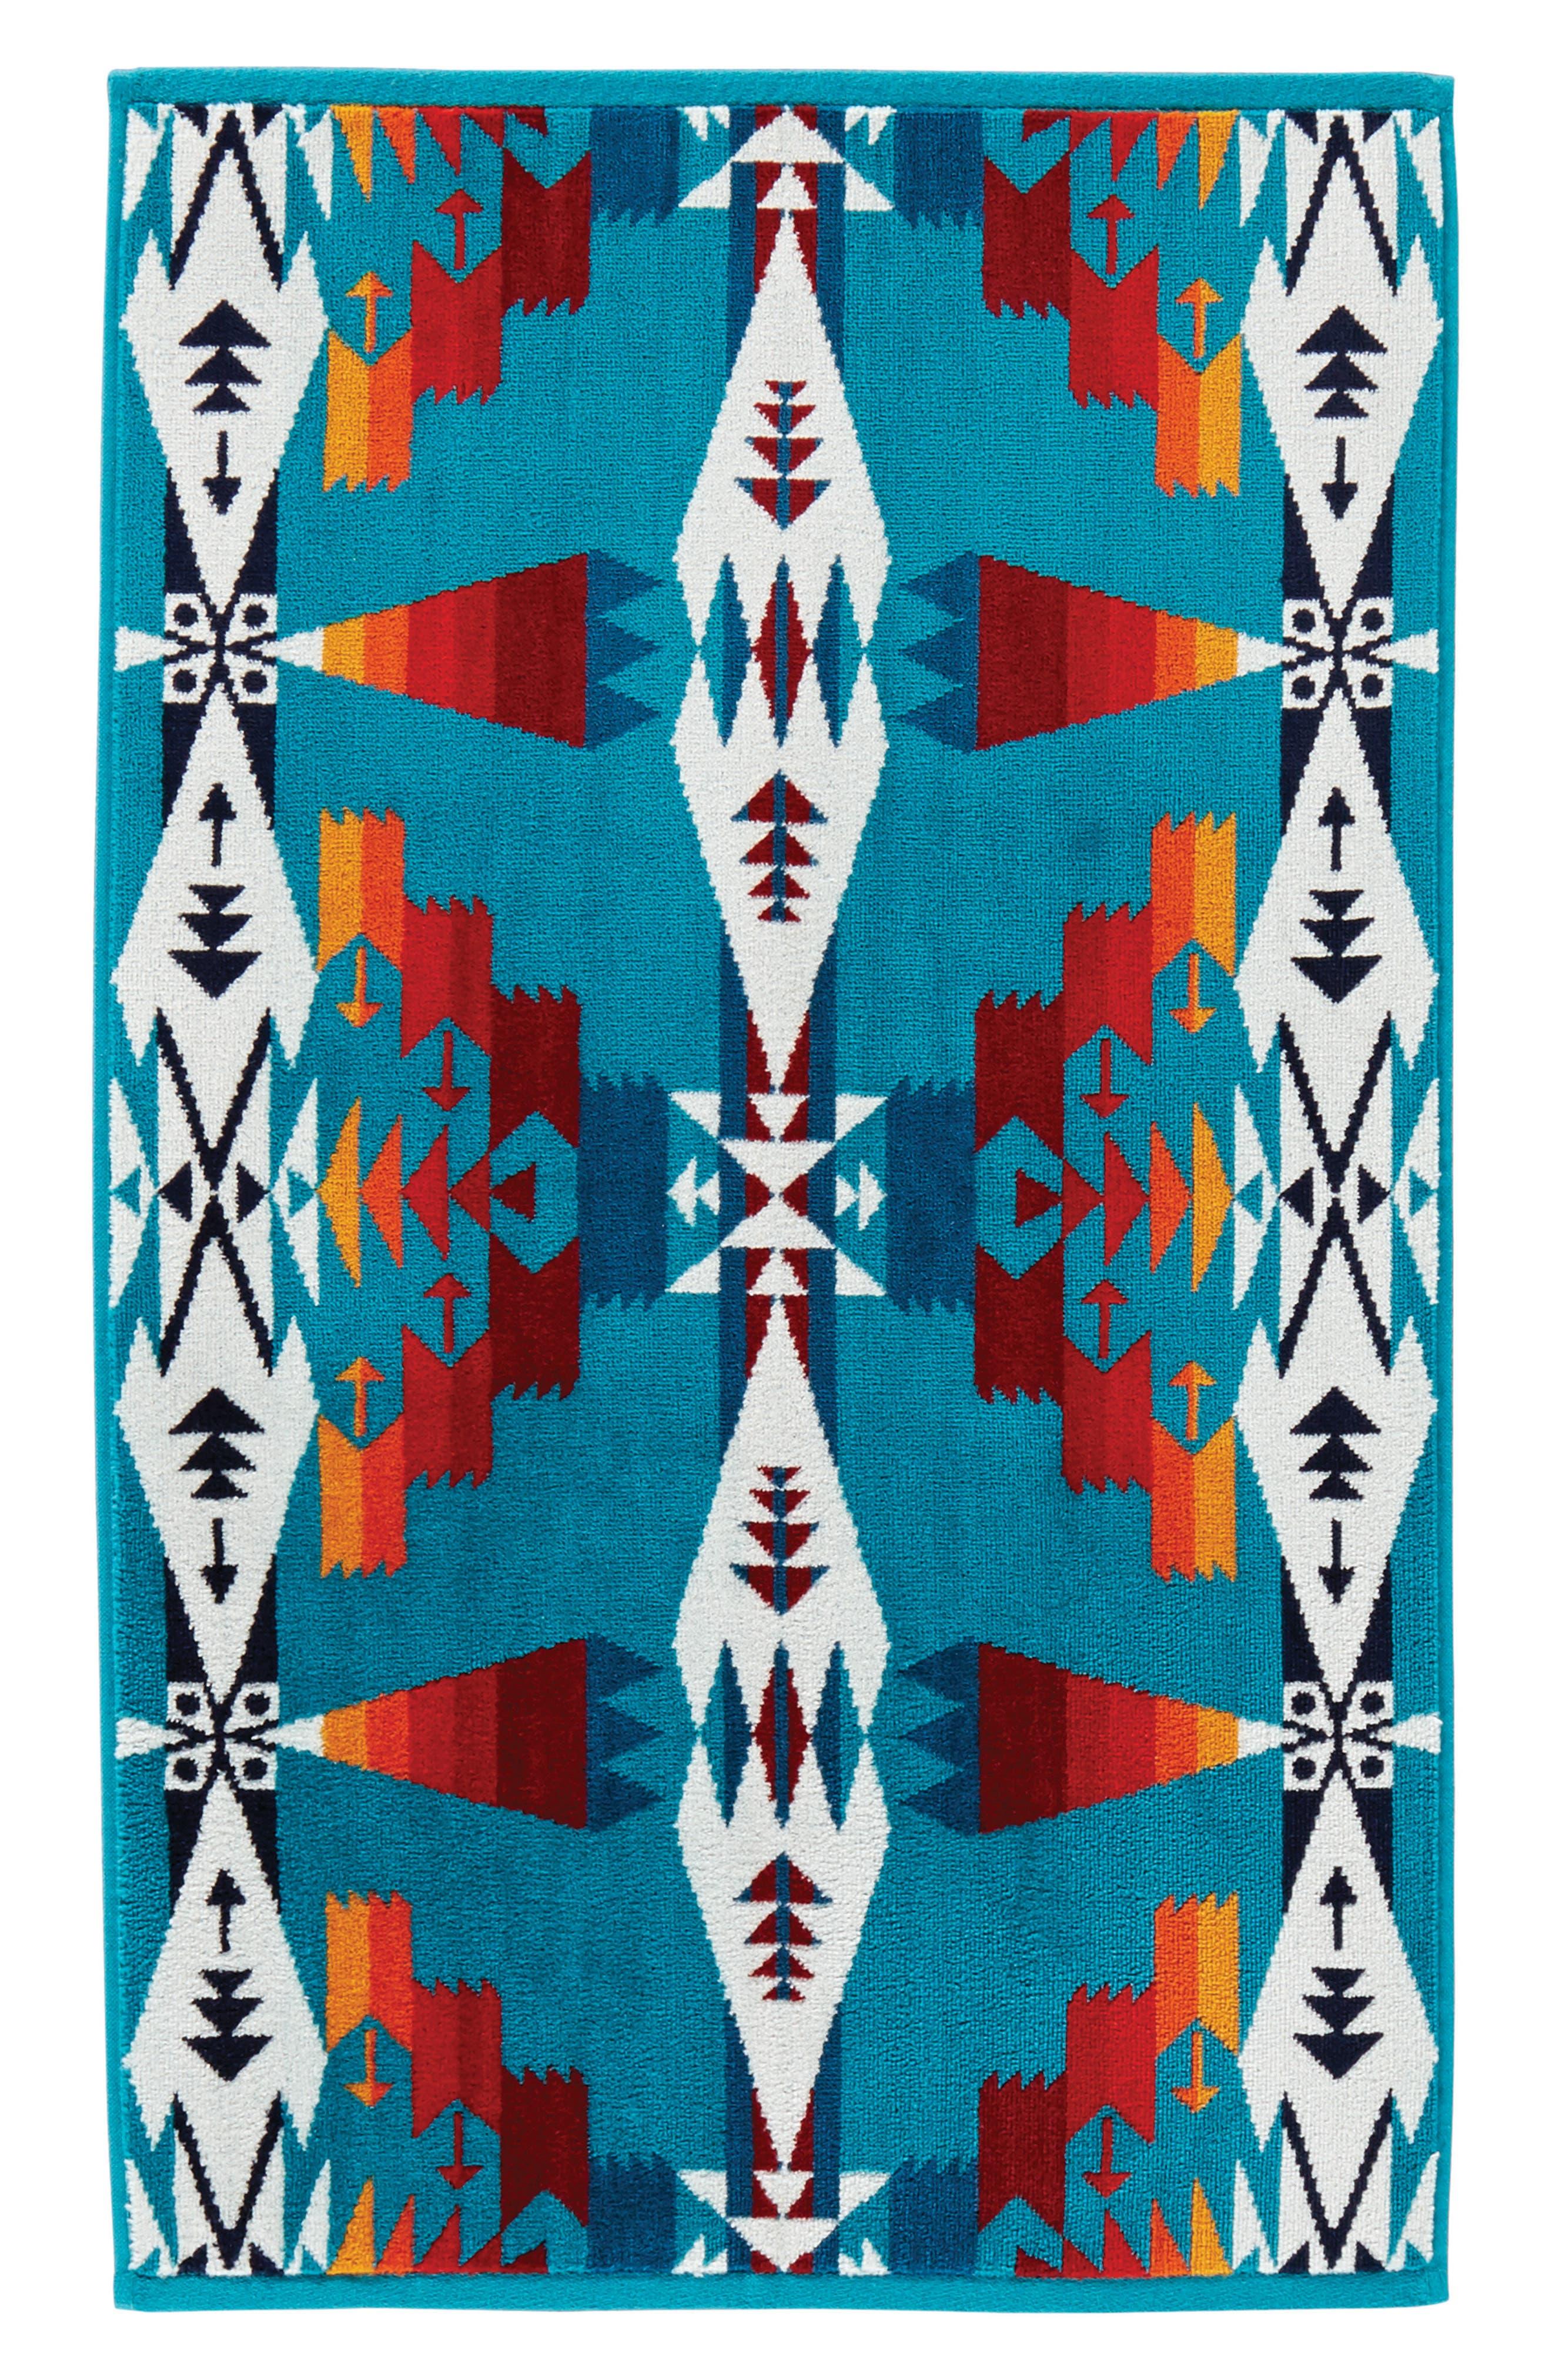 Tucson Hand Towel,                         Main,                         color, Tucson Turquoise